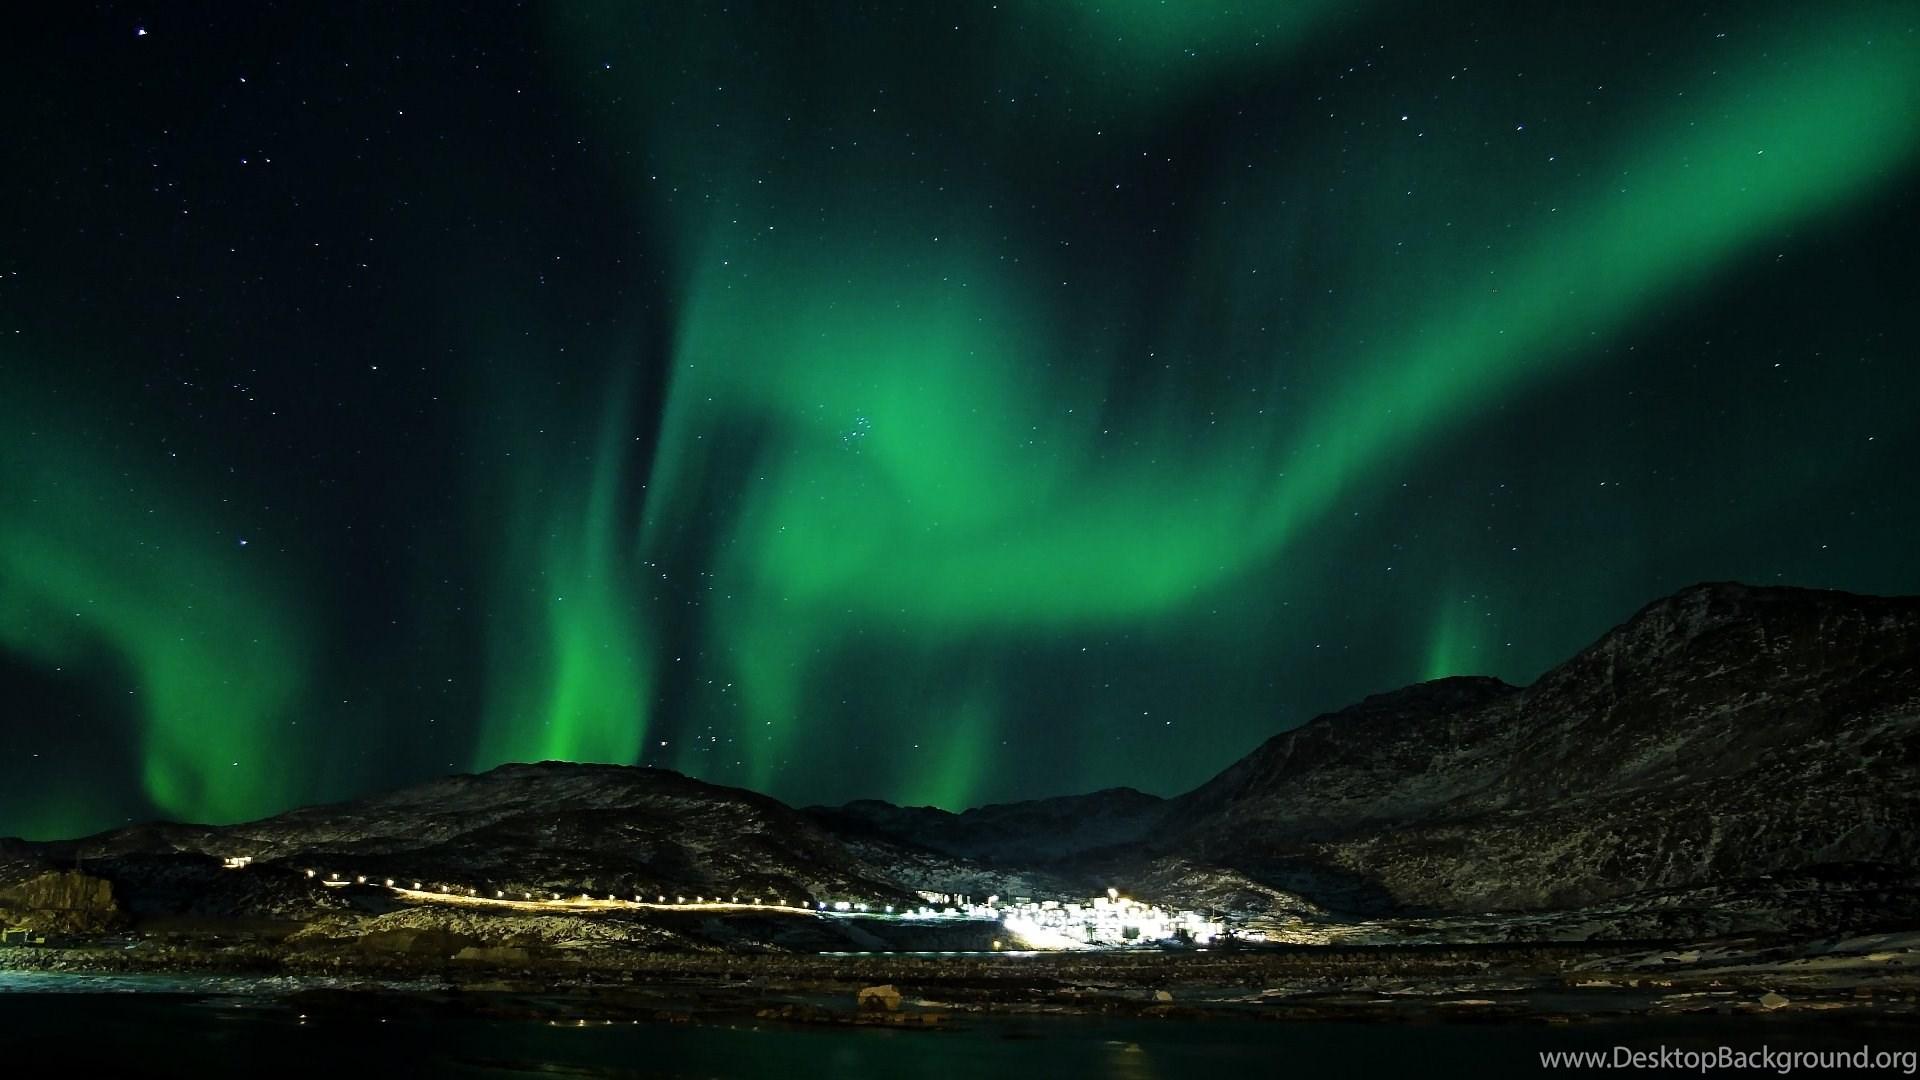 Aurora Borealis Over Village Wallpapers Desktop Background